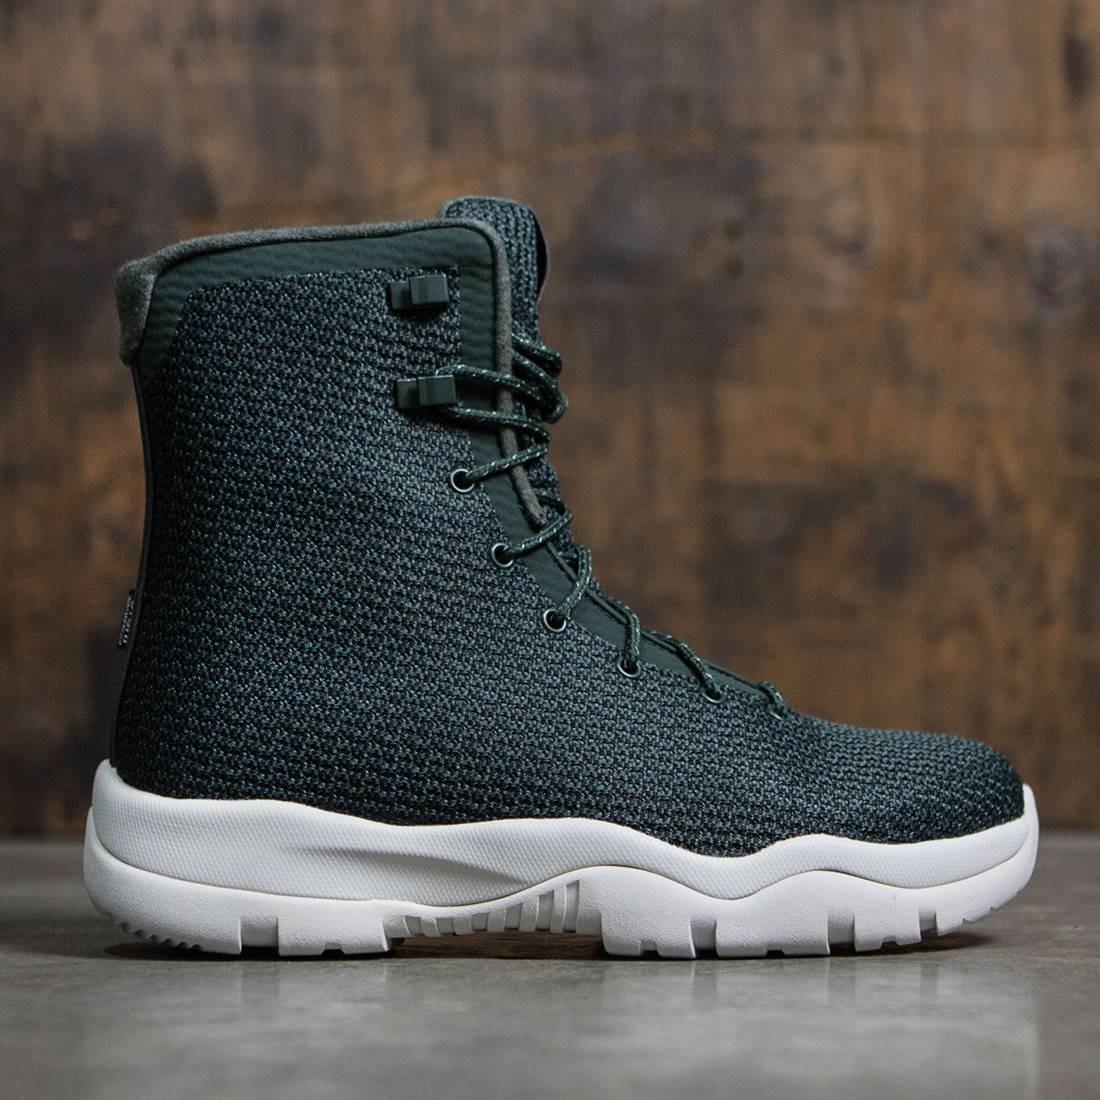 Jordan Future Boots Grove Green/Light Bone/Grove Green